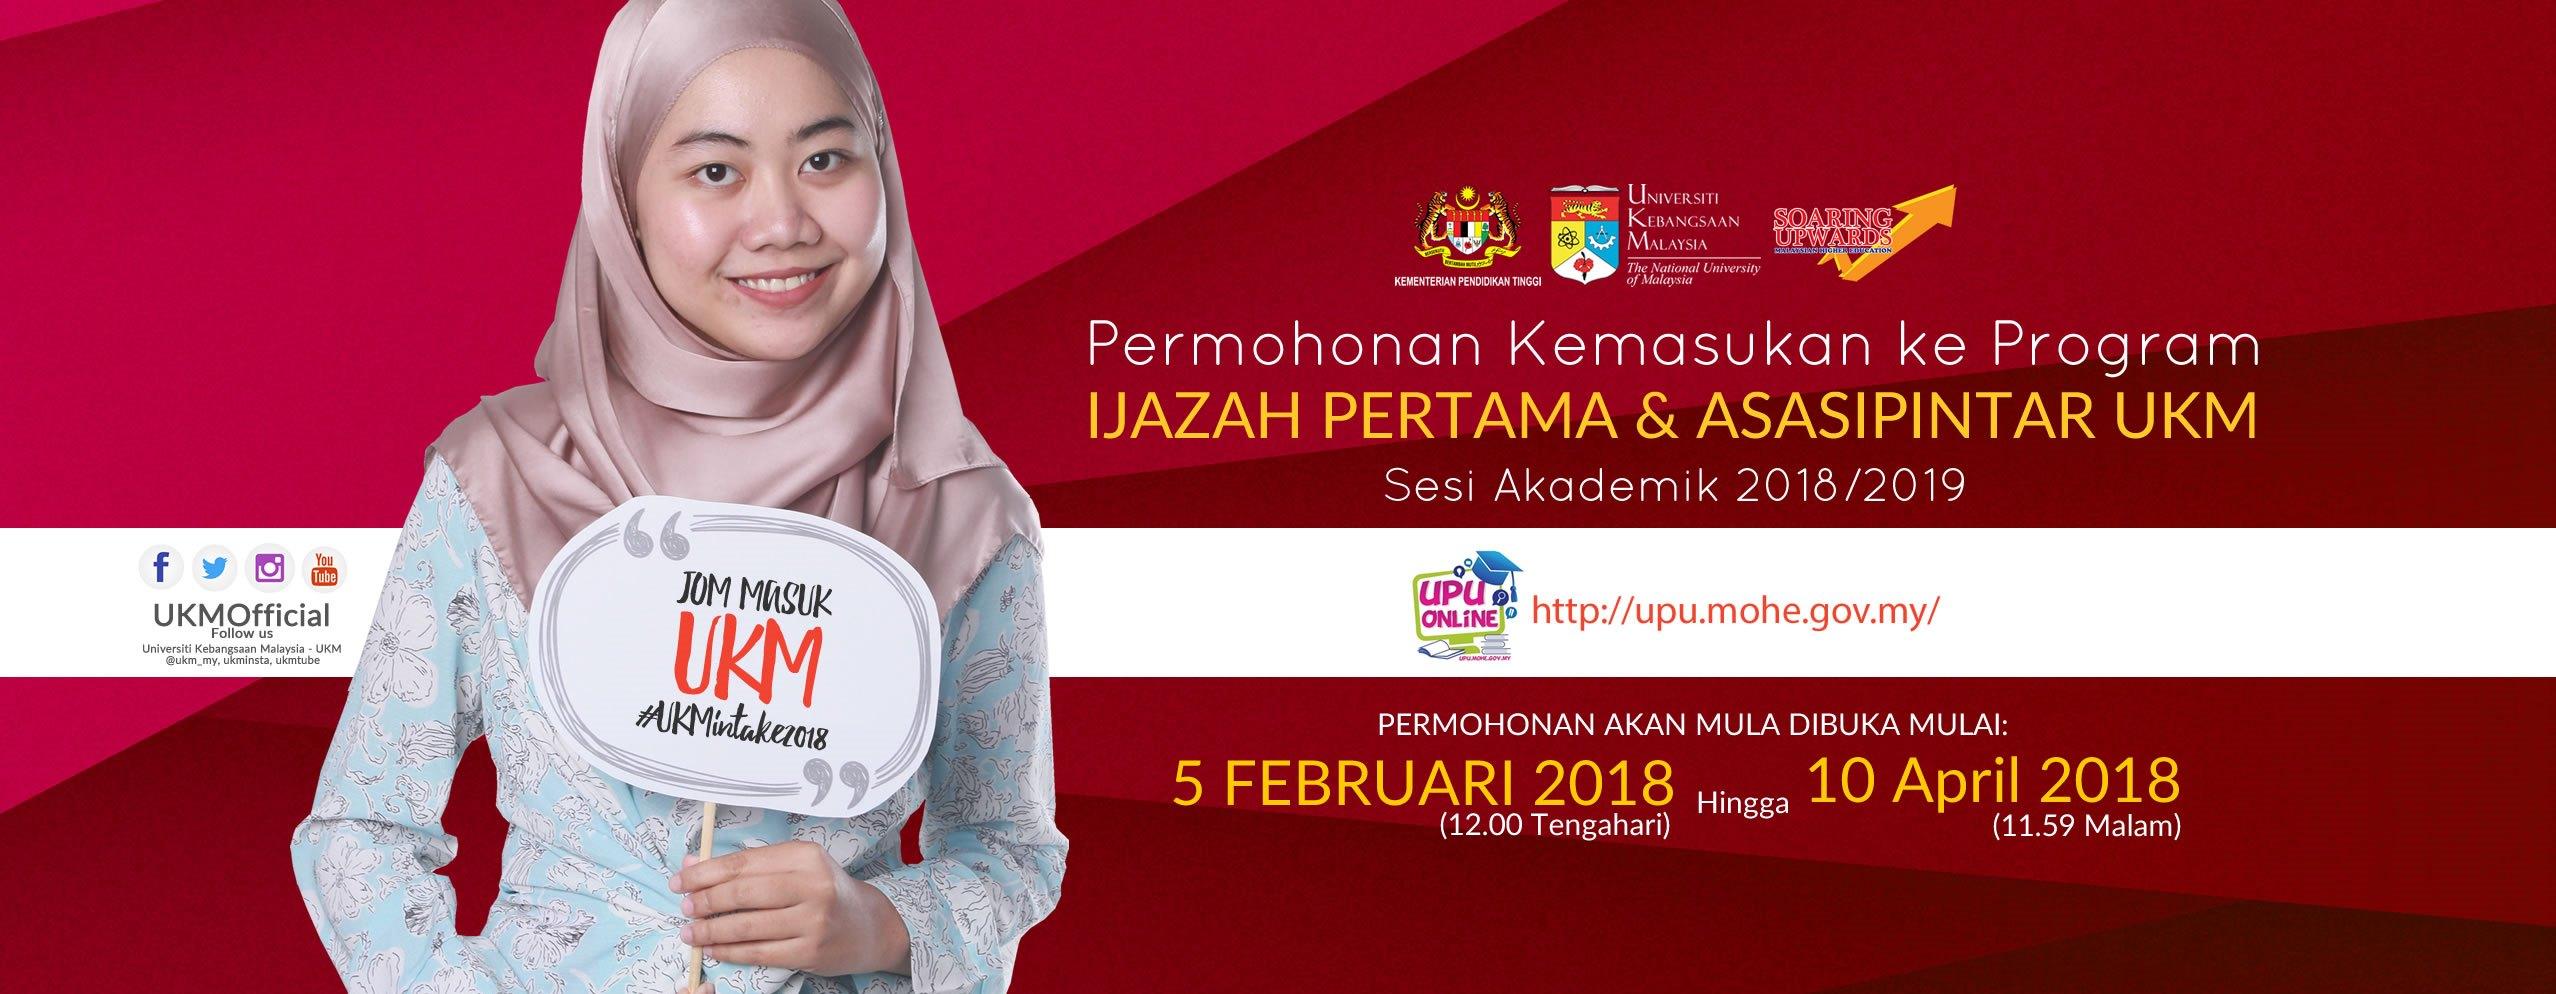 Phd coursework ukm